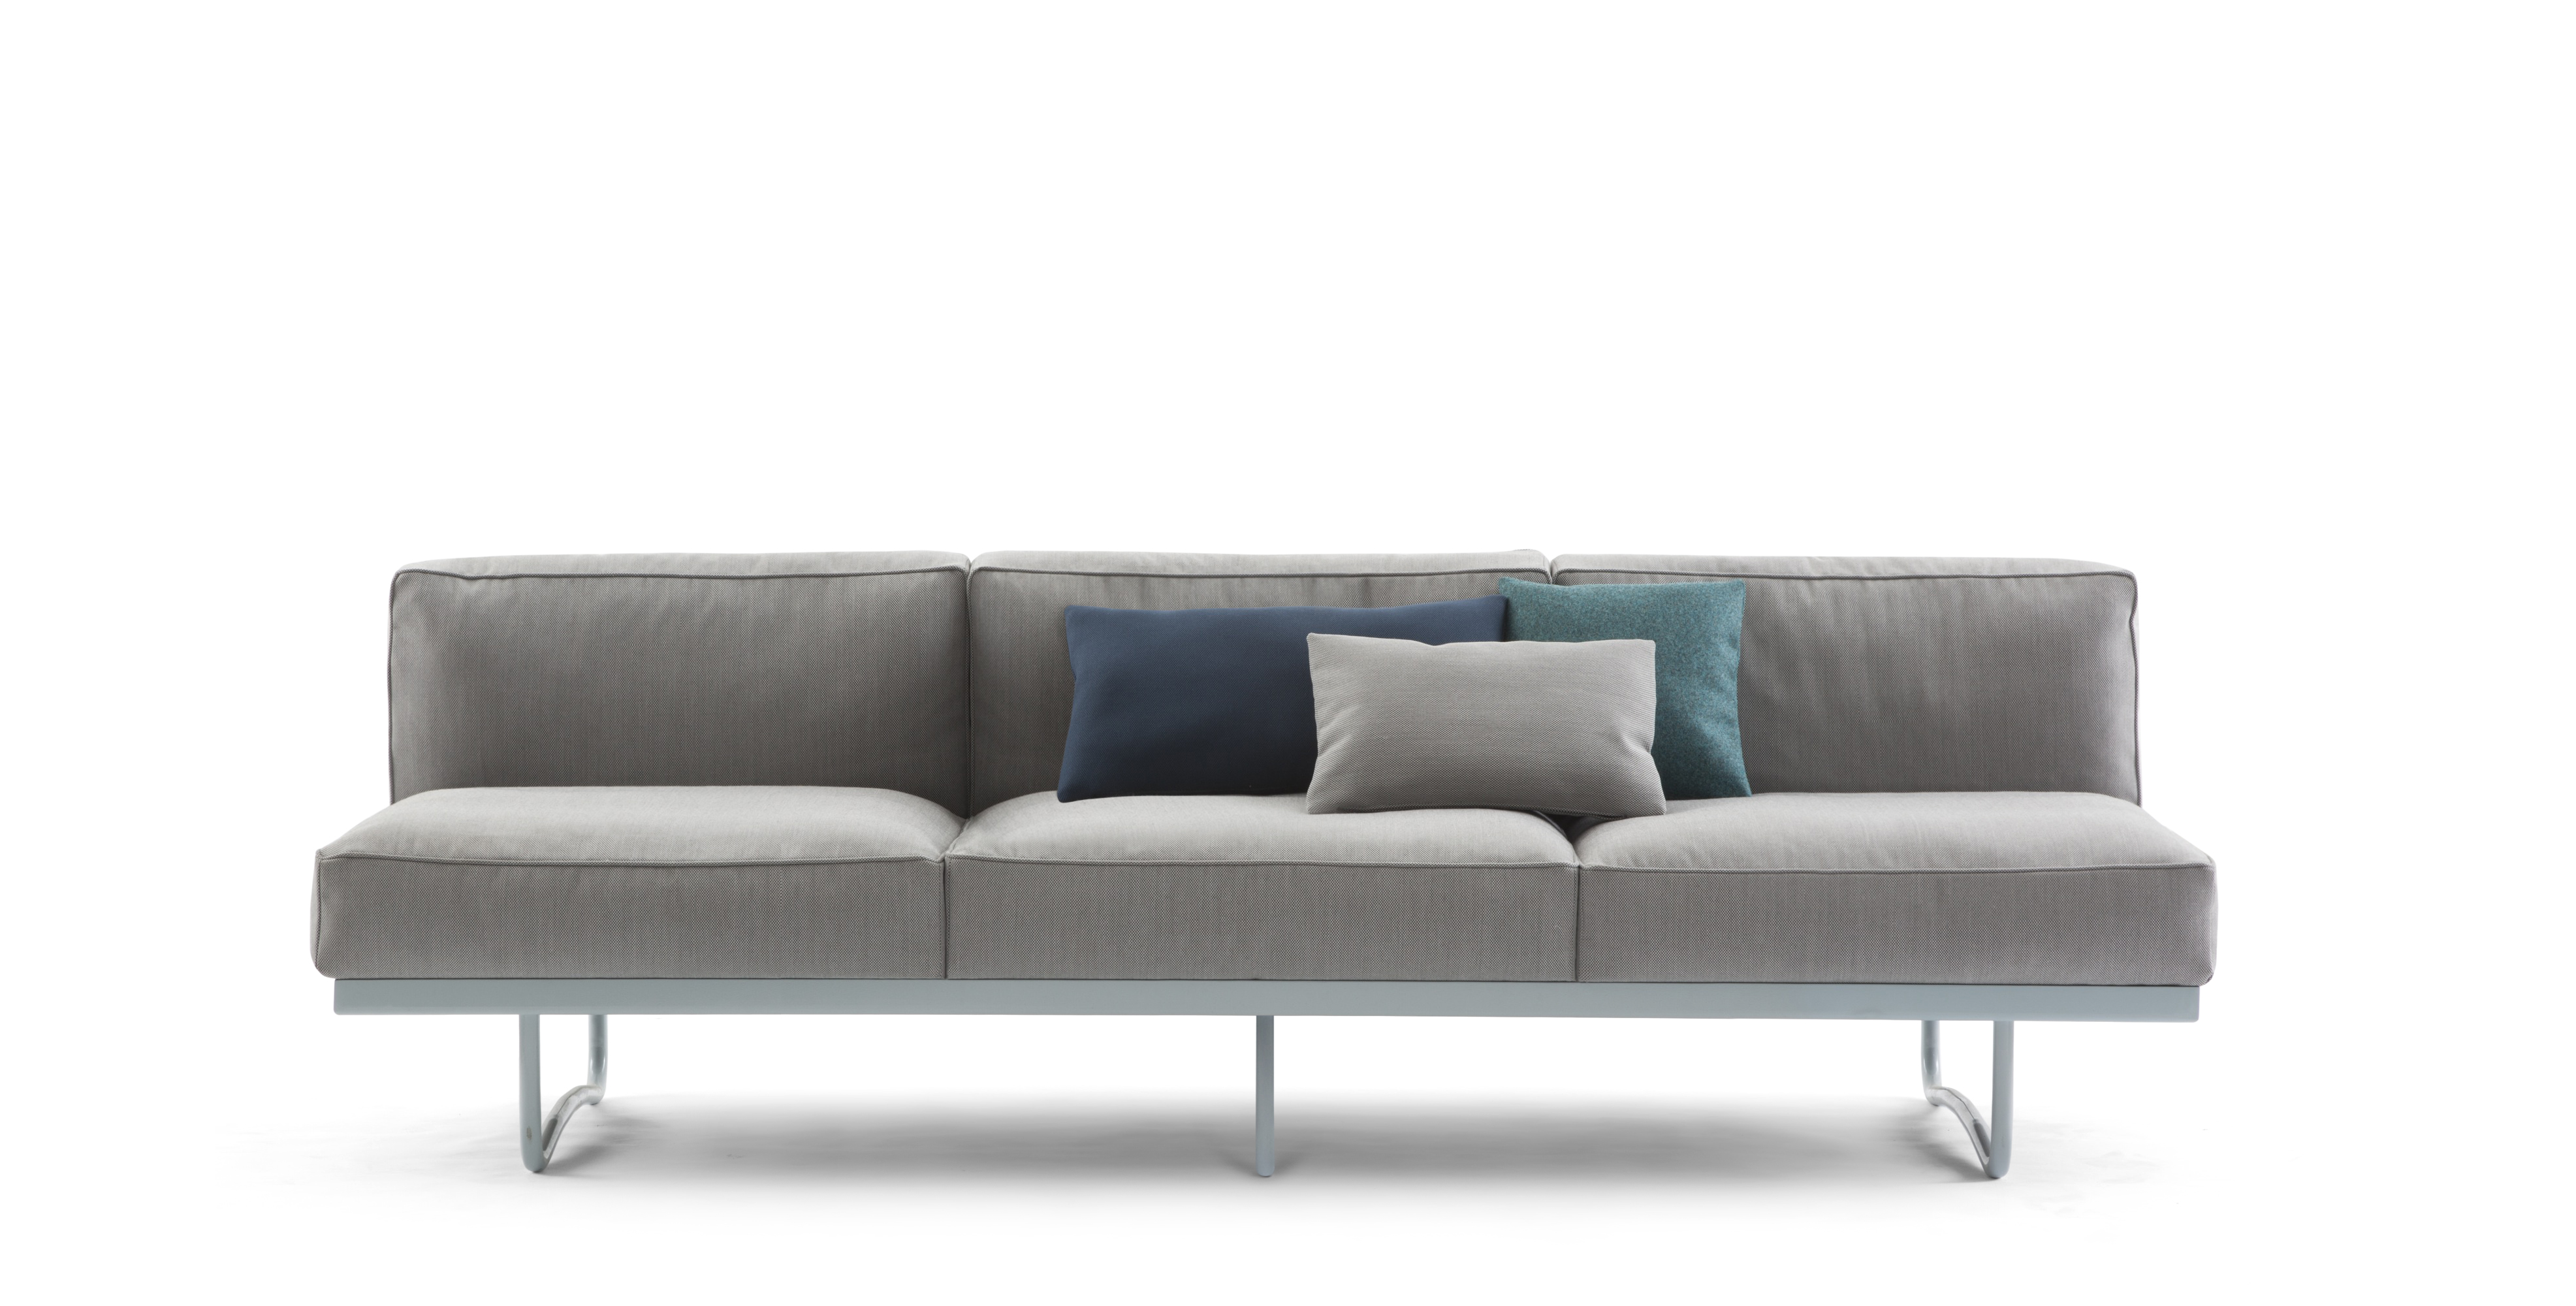 milano preview 2014 designalive. Black Bedroom Furniture Sets. Home Design Ideas